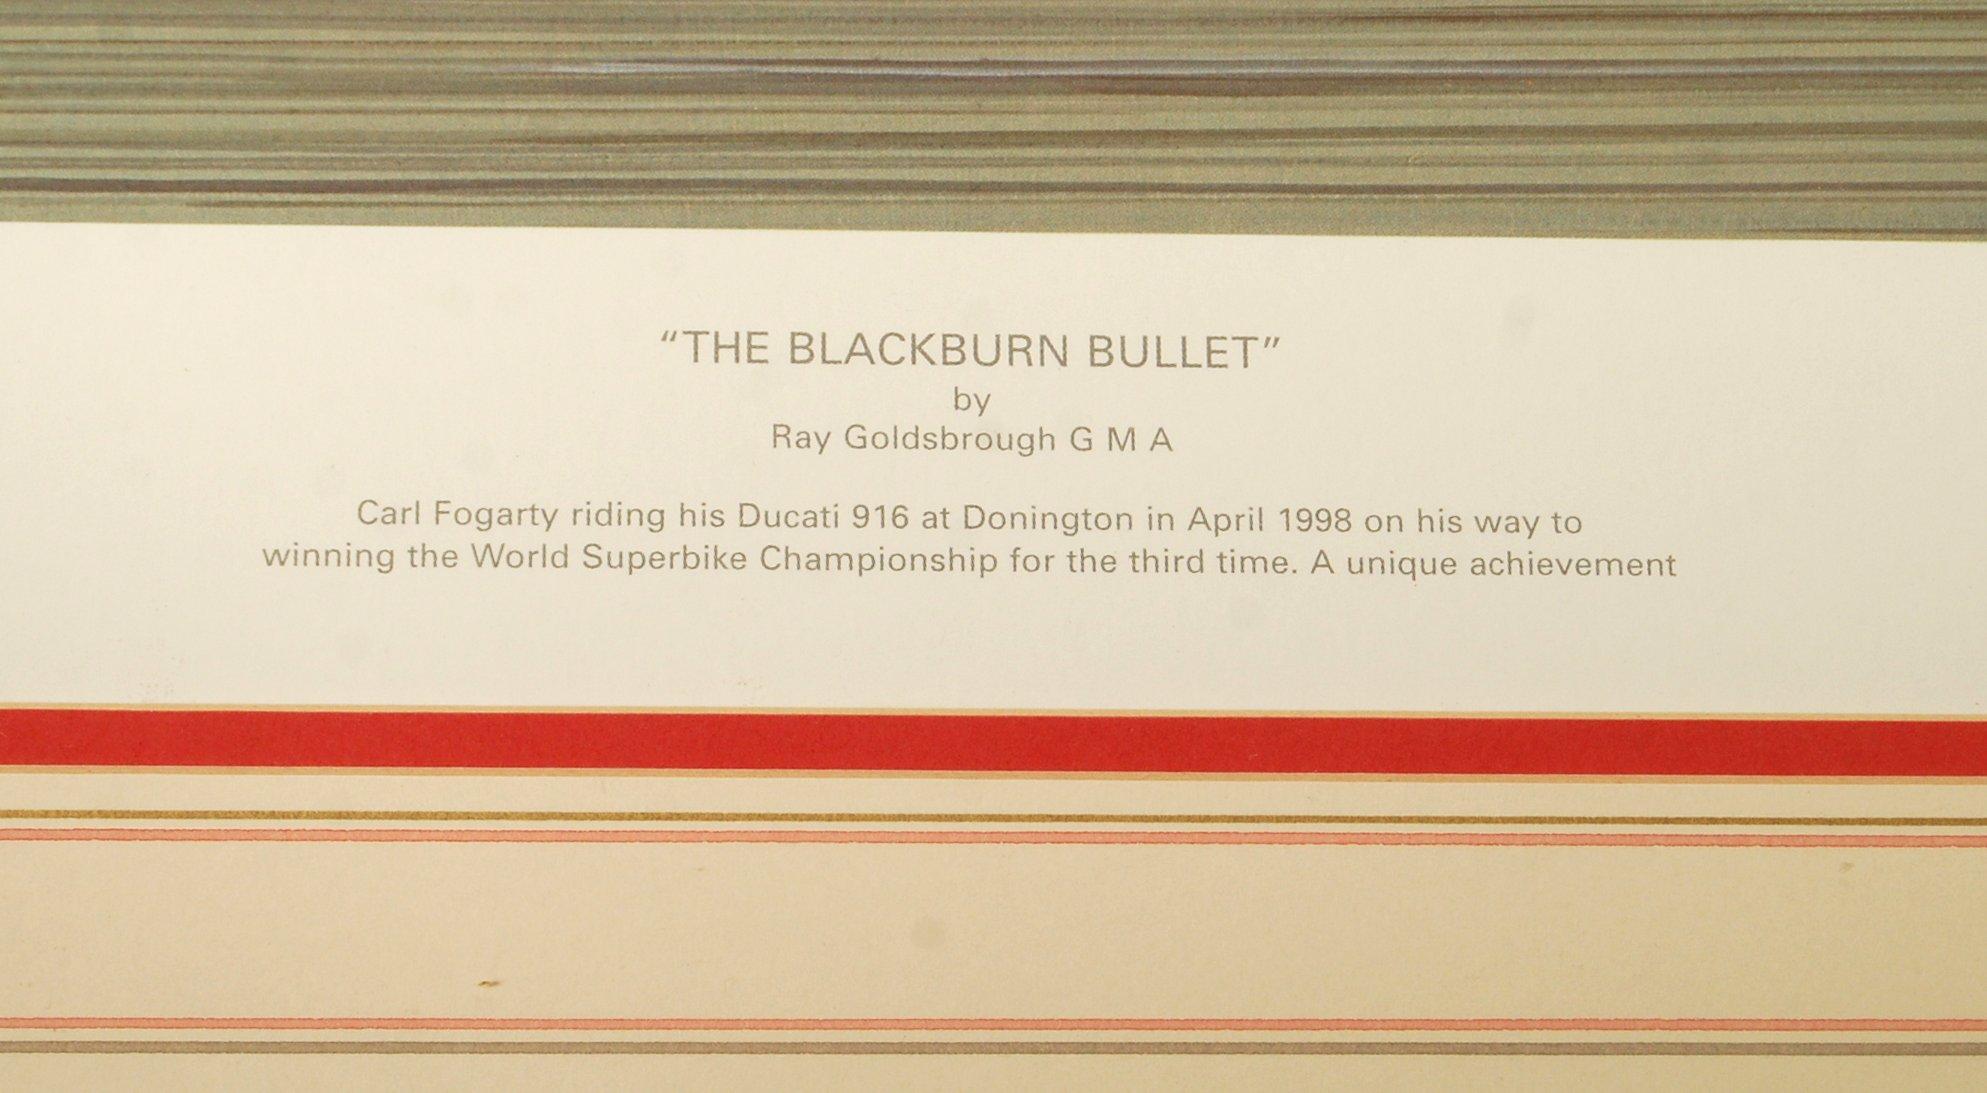 ' THE BLACKBURN BULLET ' BY R. GOLDBROUGH GMA AUTO - Image 4 of 6